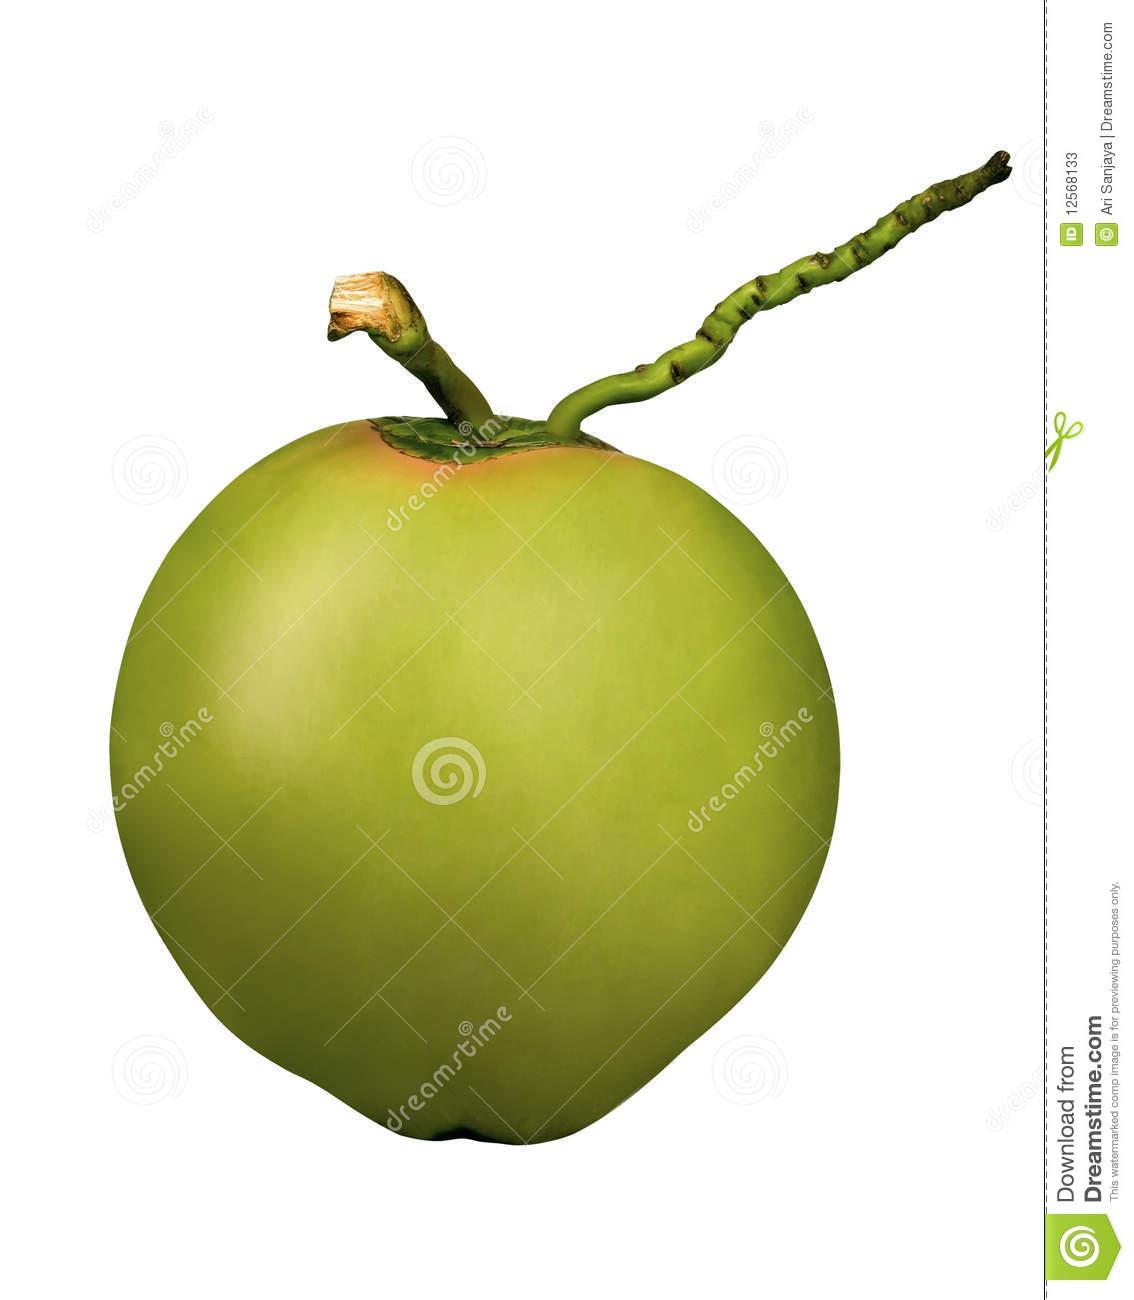 Green coconut clipart.